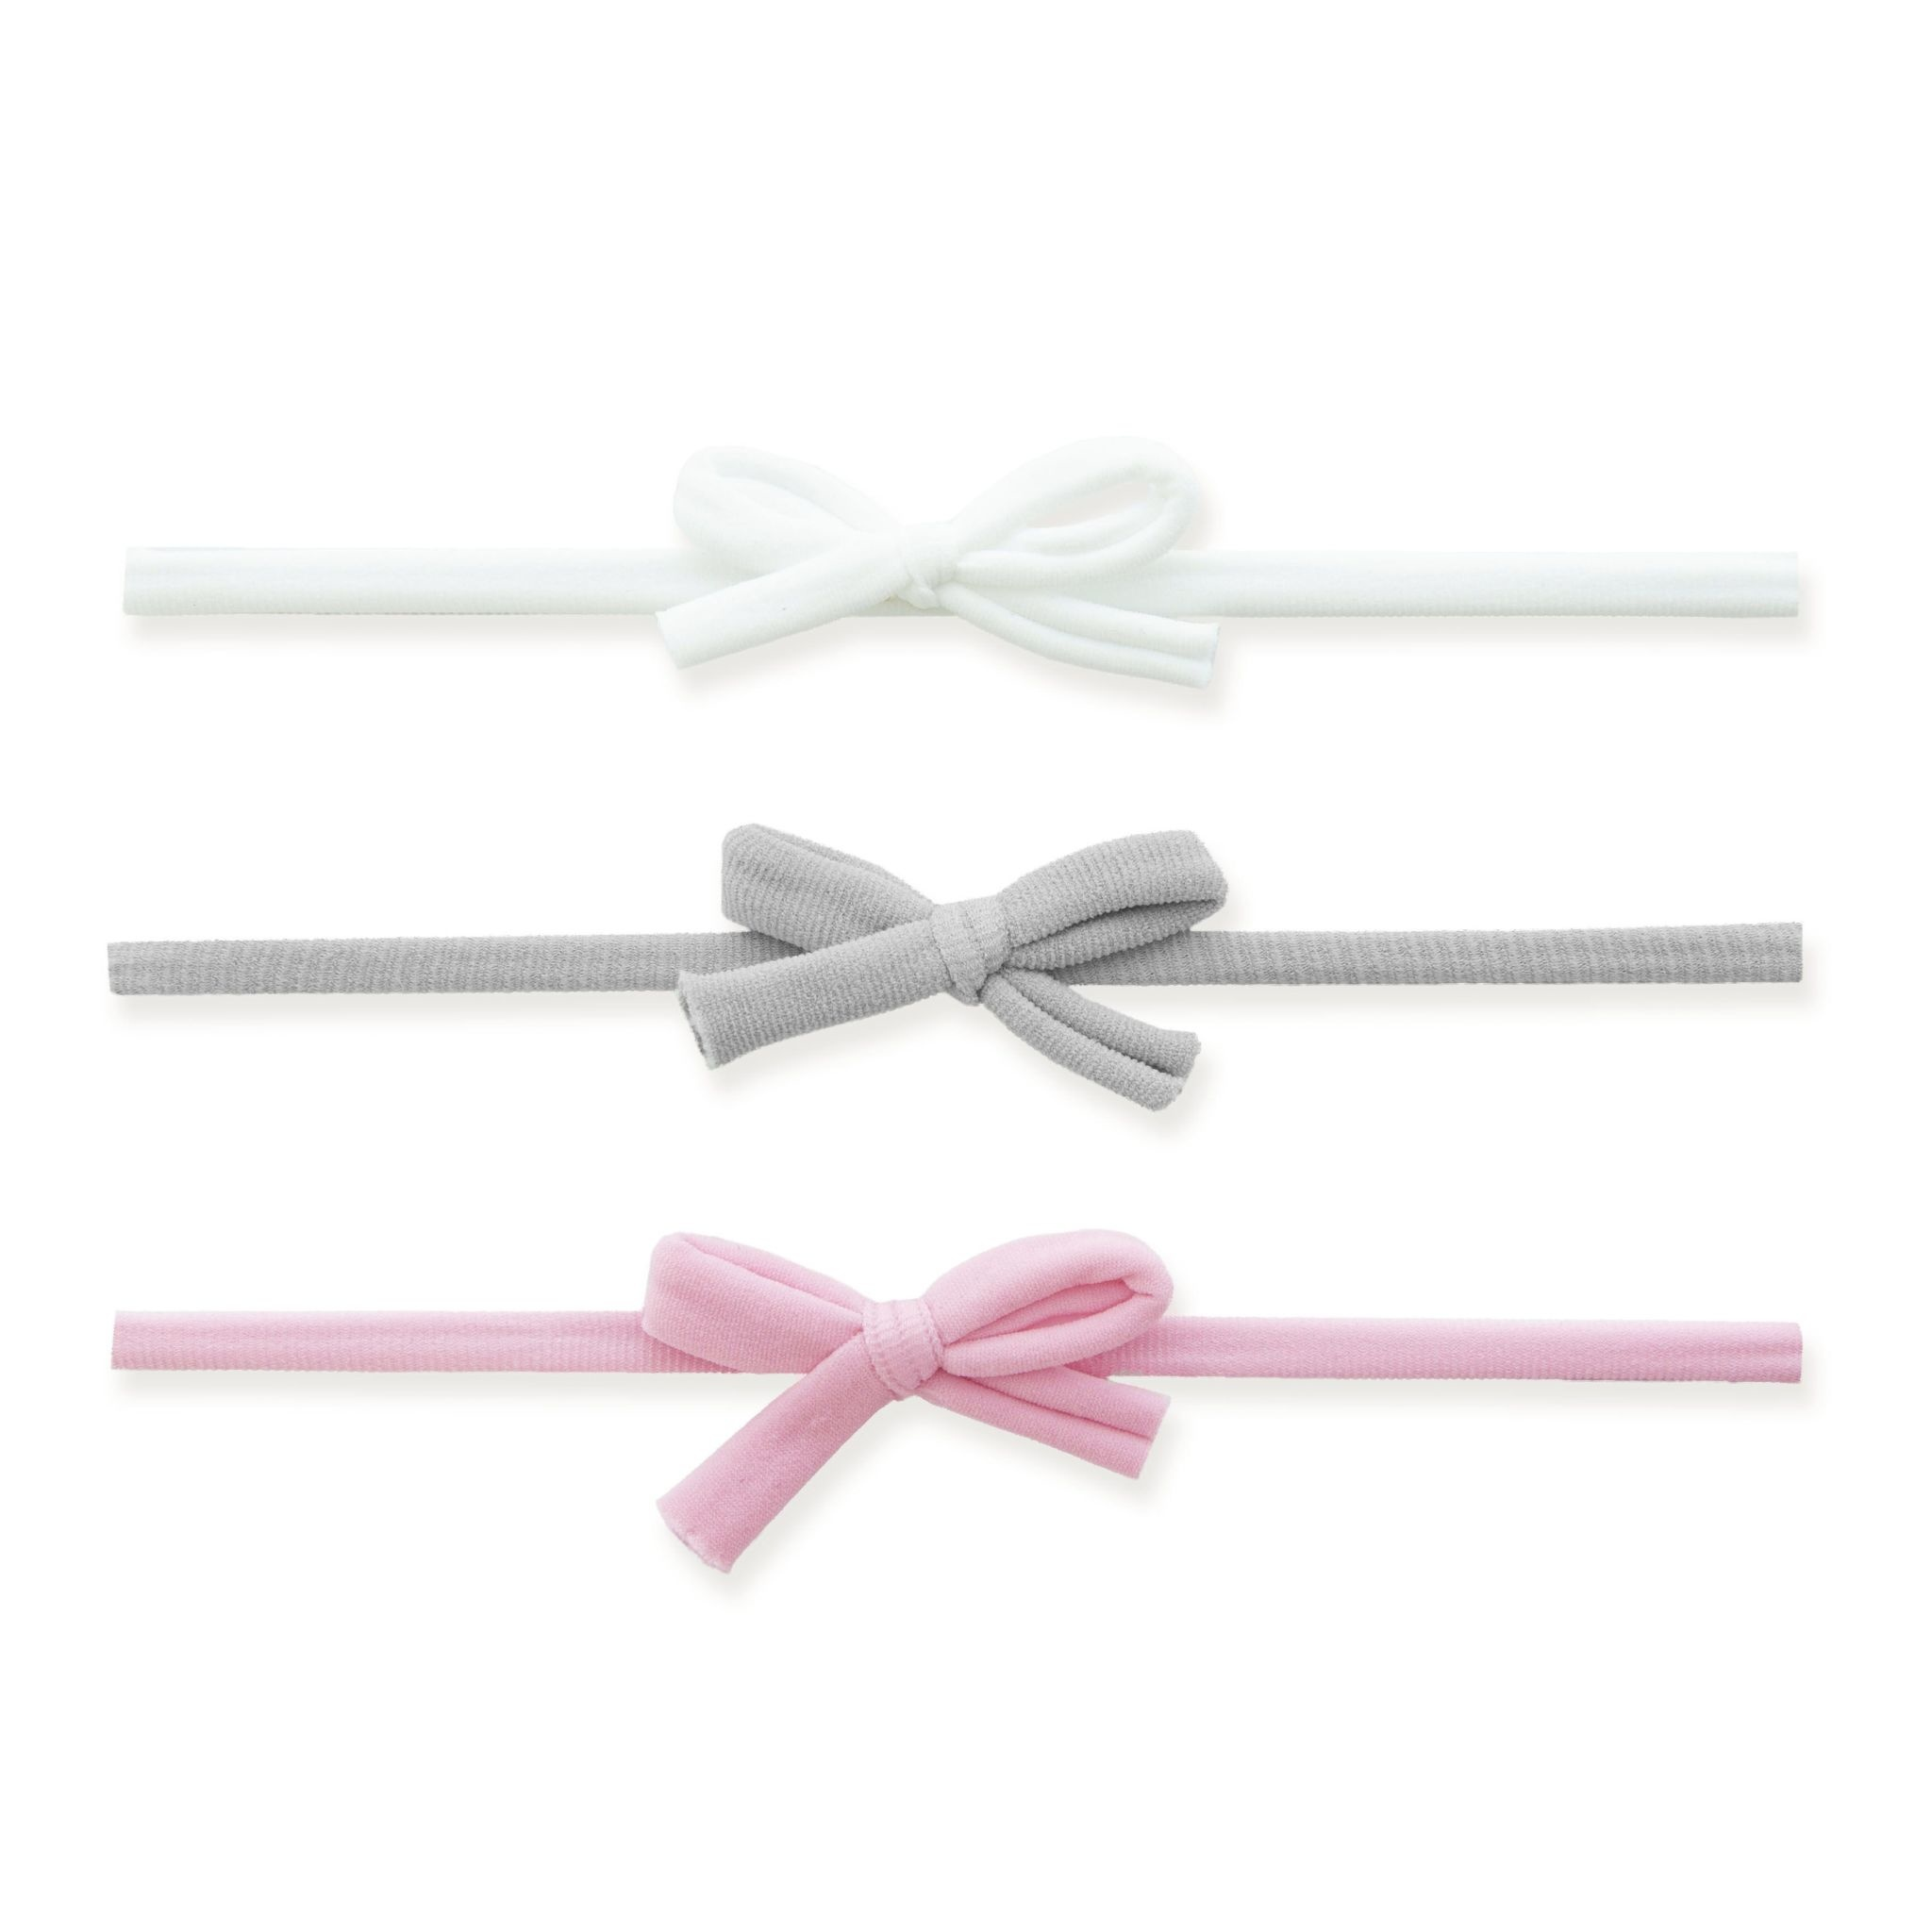 Baby Bling Bows 3pk Natural Skinnies - pink, gray, white